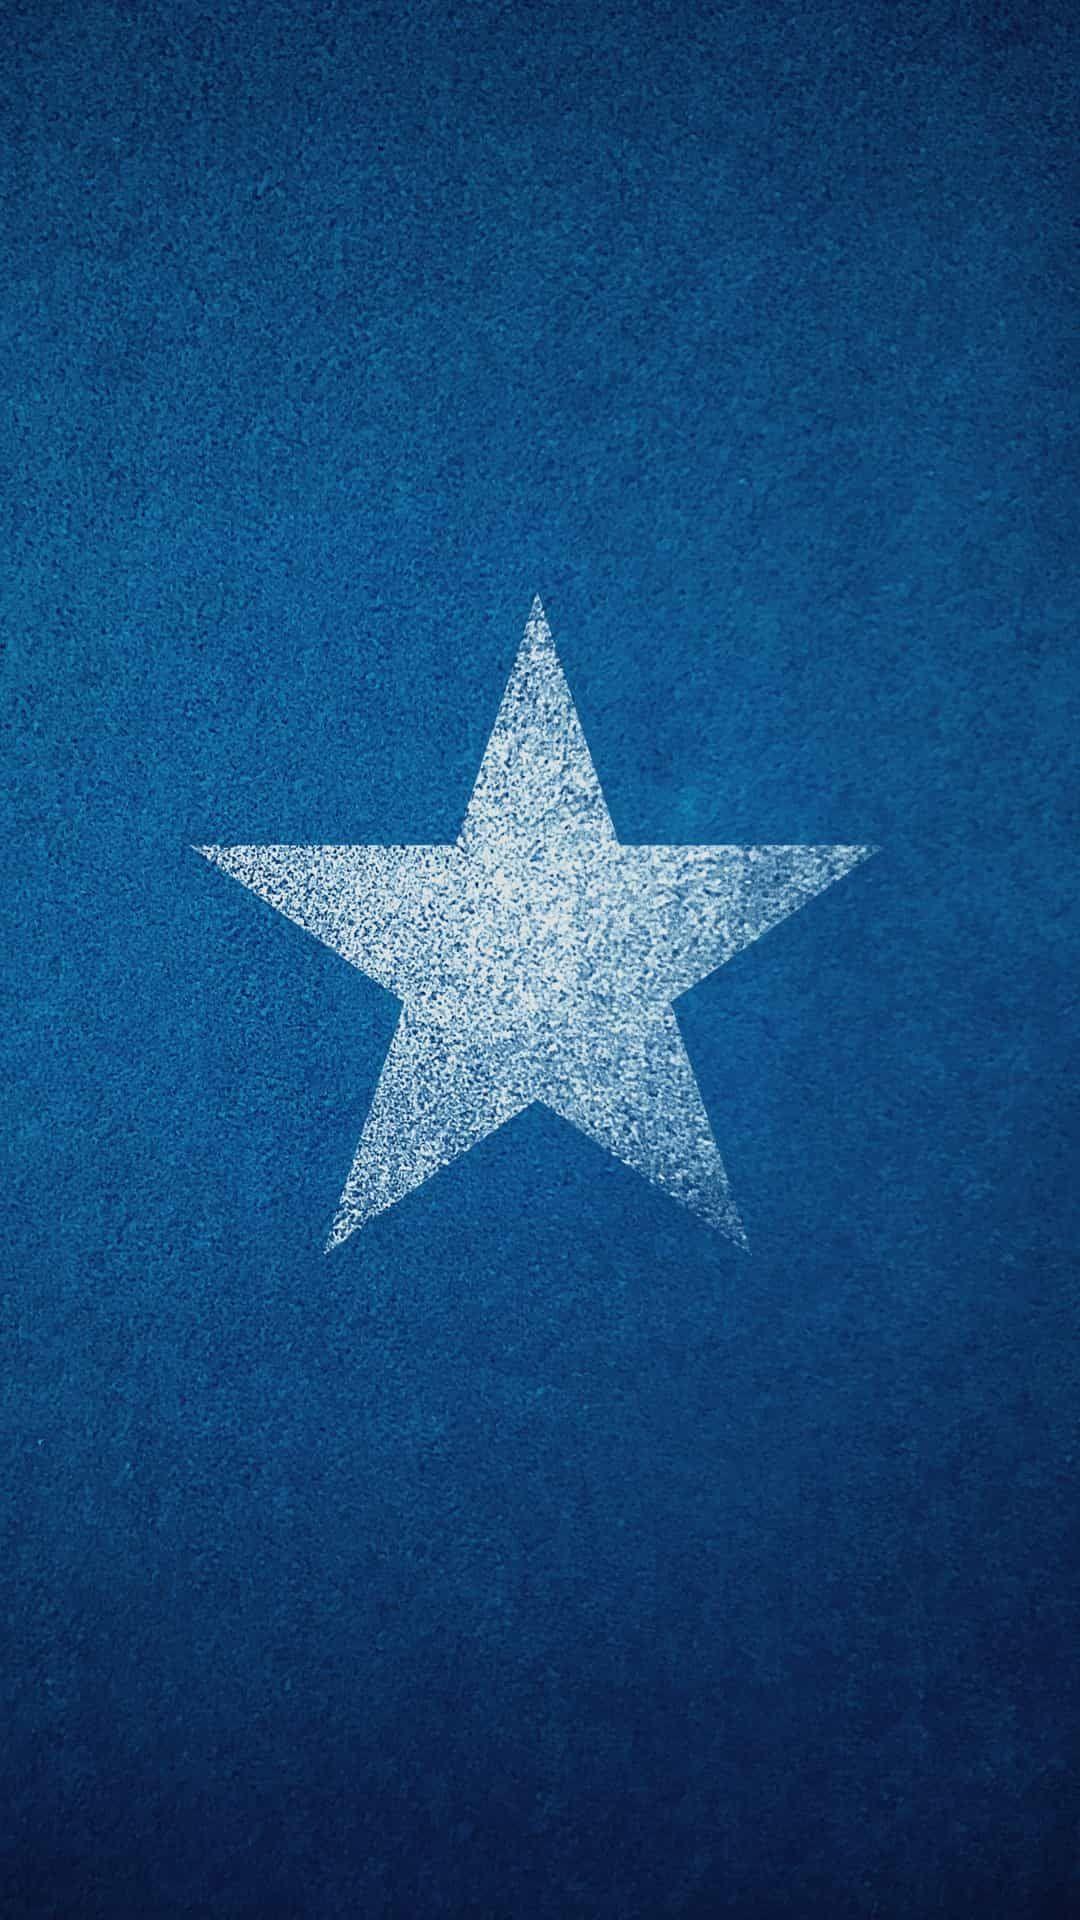 خلفيات ايفون Star Wallpaper Iphone Wallpaper Video Superhero Wallpaper